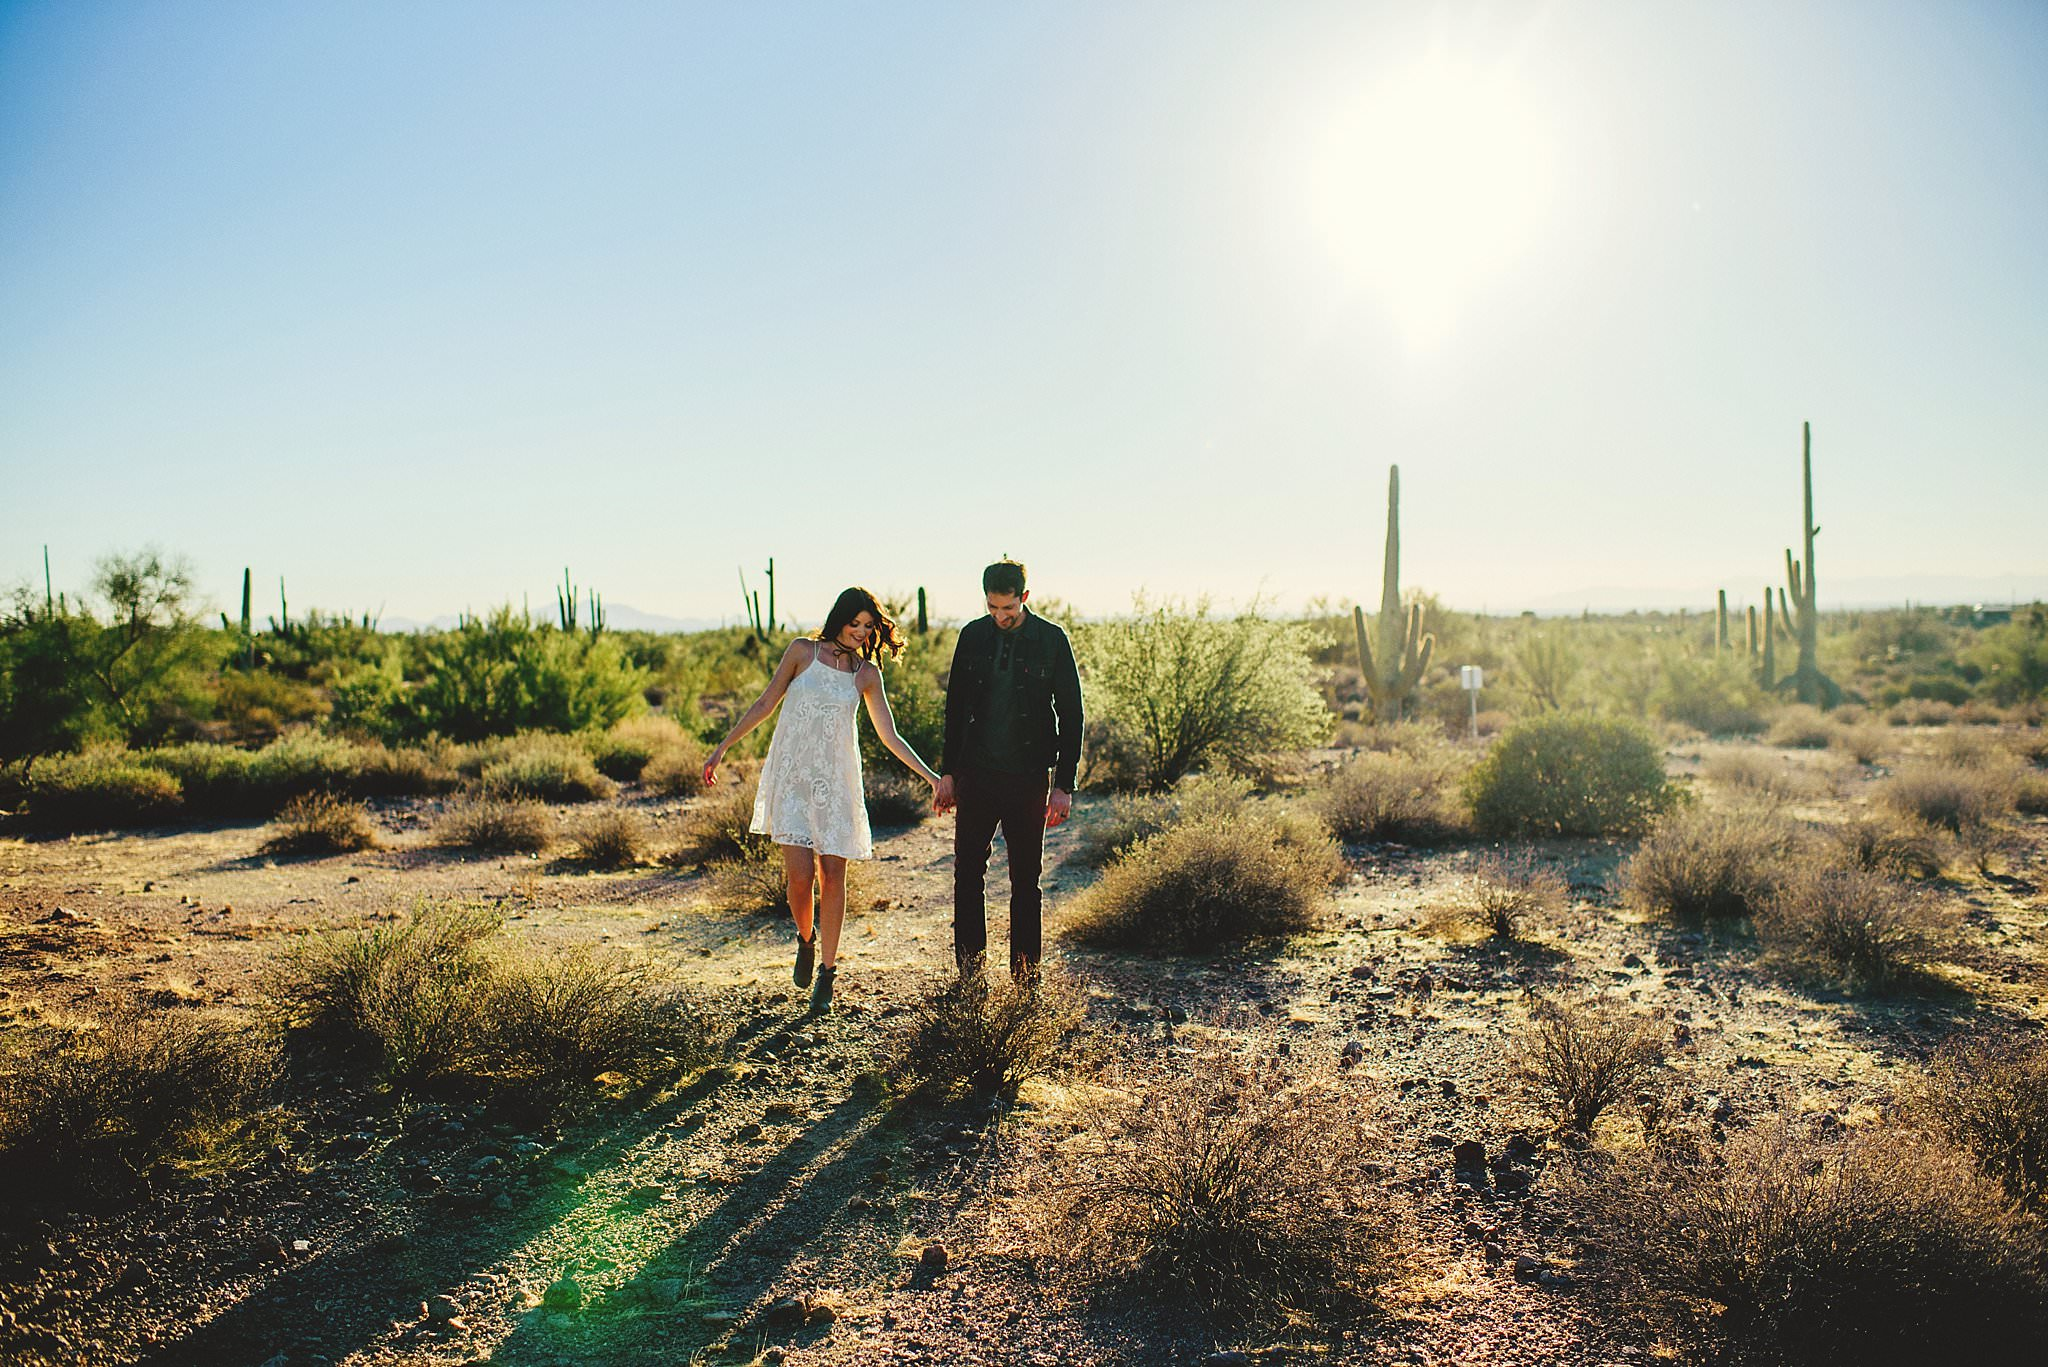 superstition-mountains-desert-engagement-photos-0006.jpg